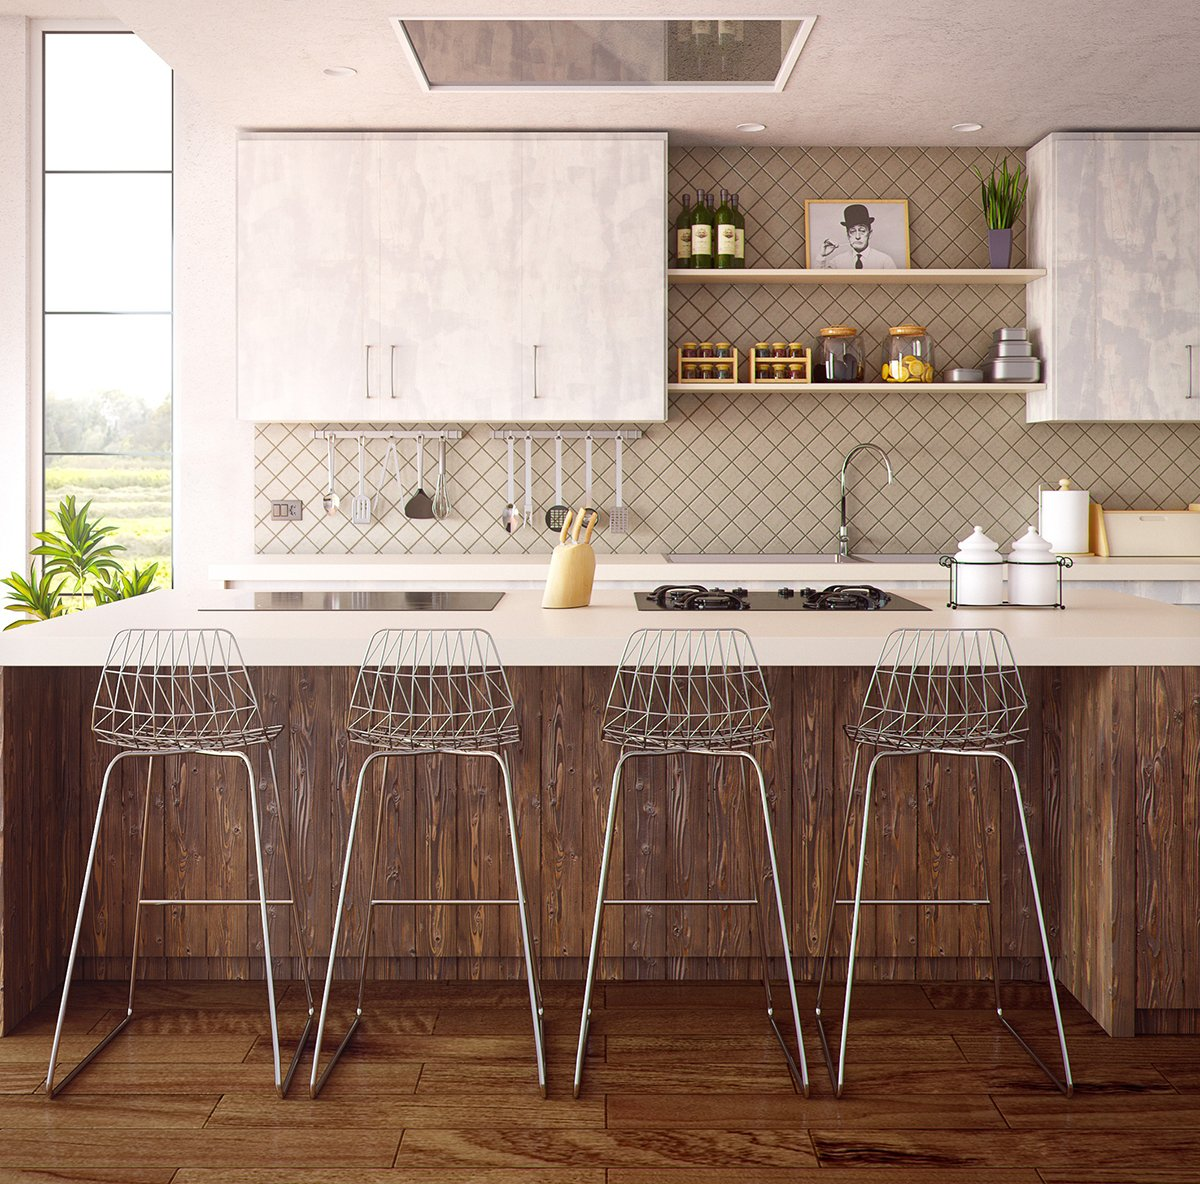 Soinco _soinco Twitter # Muebles Cocinas Soinco